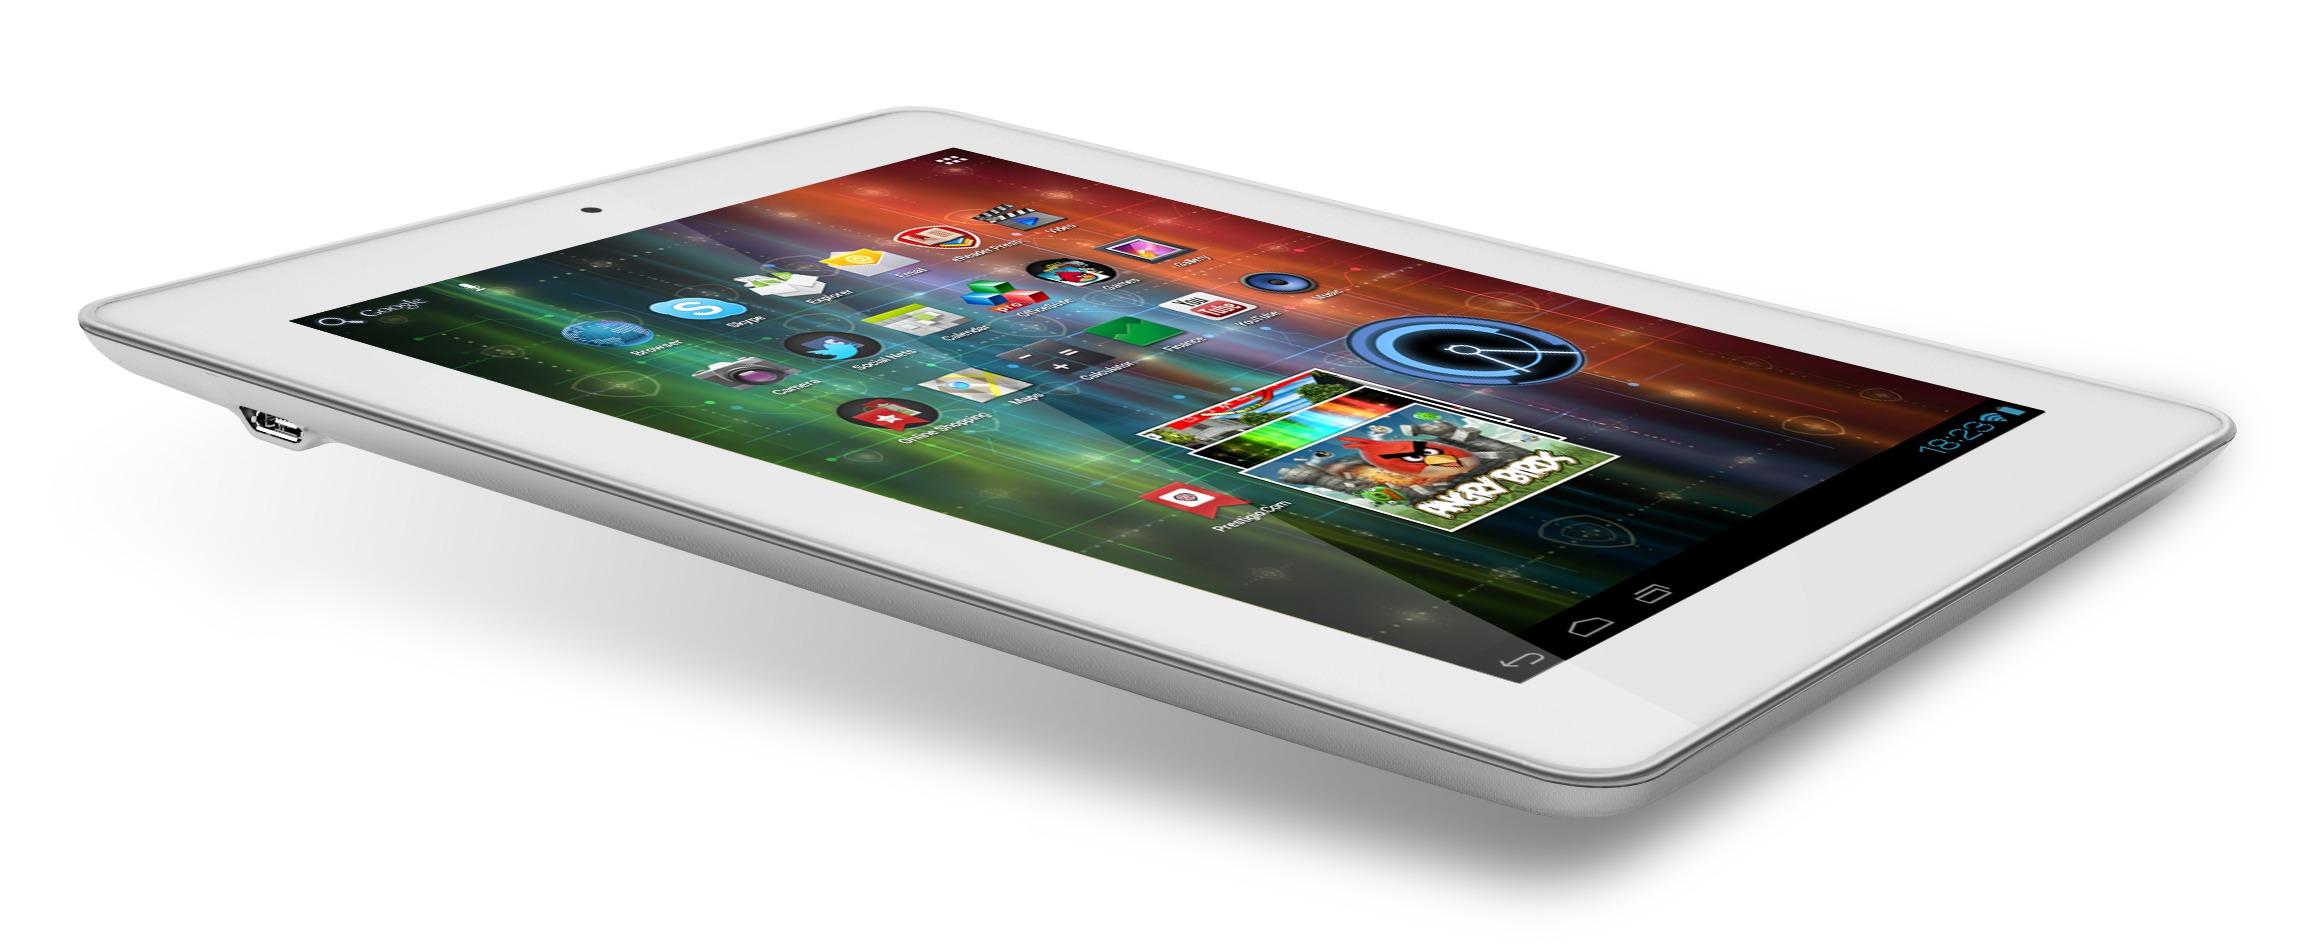 A Prestigio táblagépek új generációja: MultiPad 2 Ultra Duo 8.0 és MultiPad 2 Ultra Duo 8.0 3G